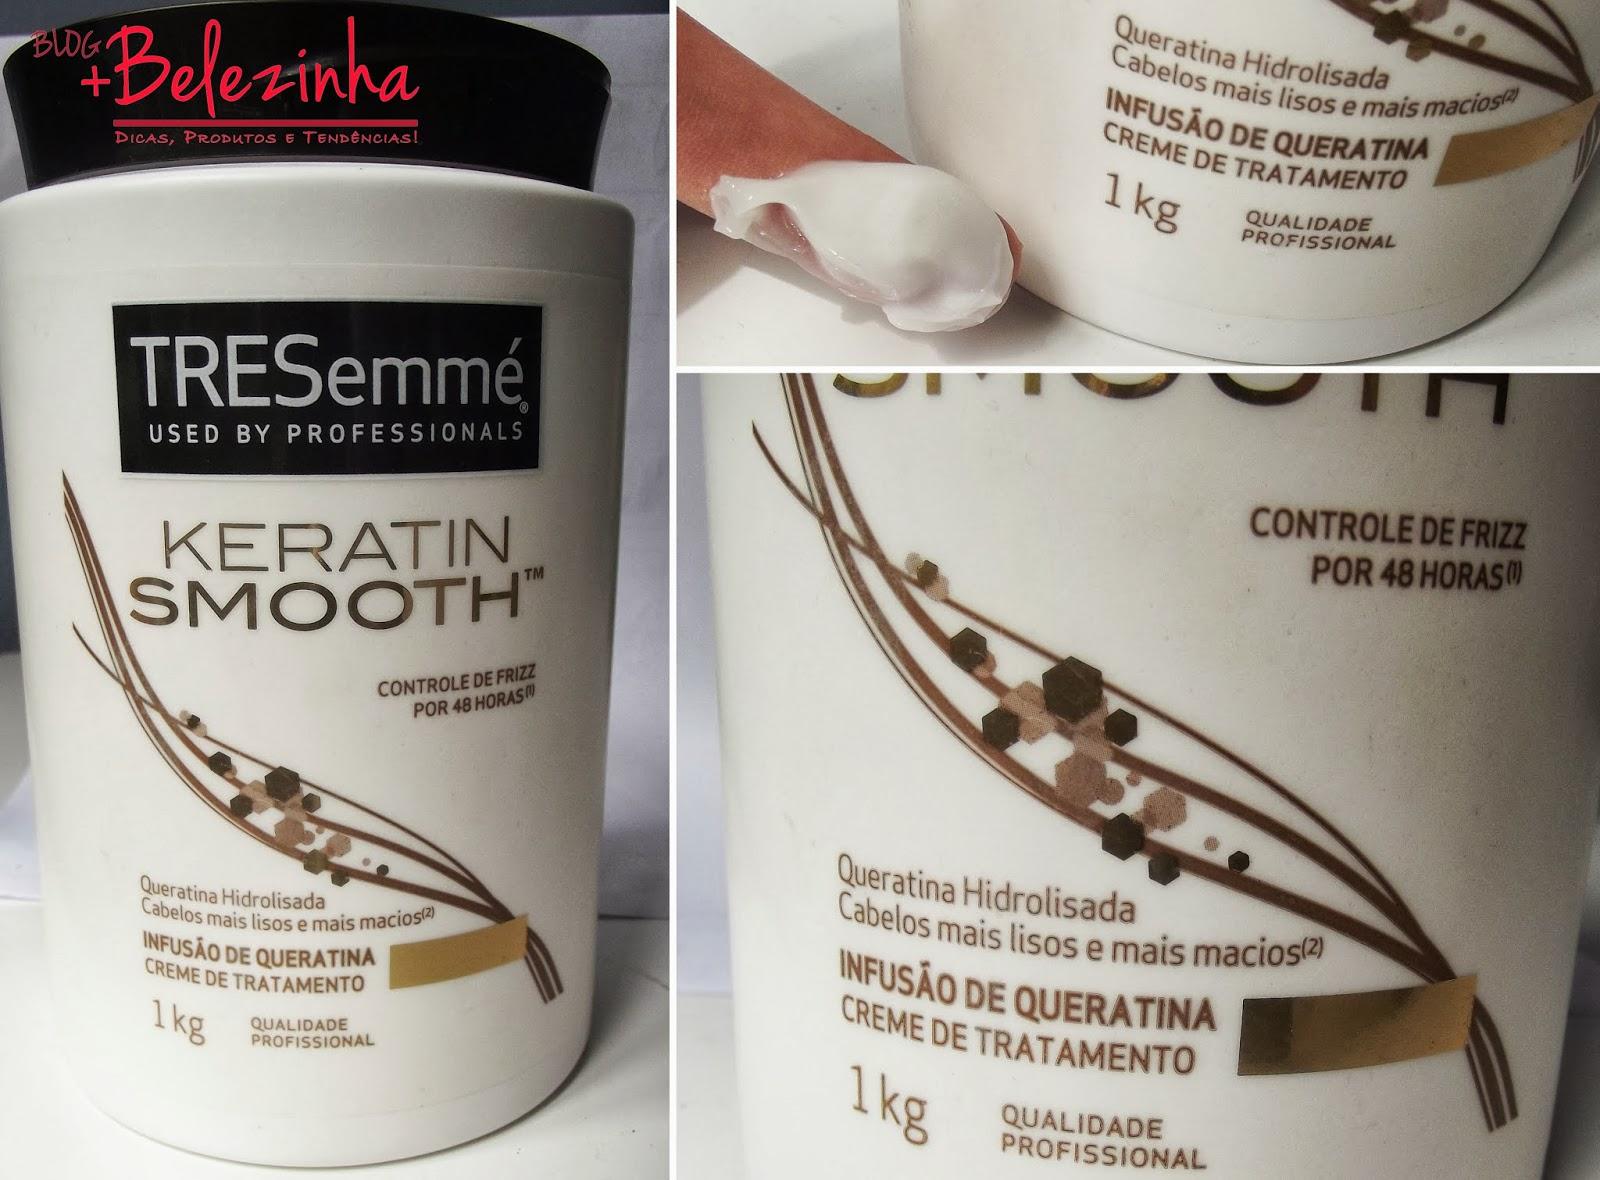 tresemmé-keratin-smooth-queratina-hidrolisada-creme-tratamento